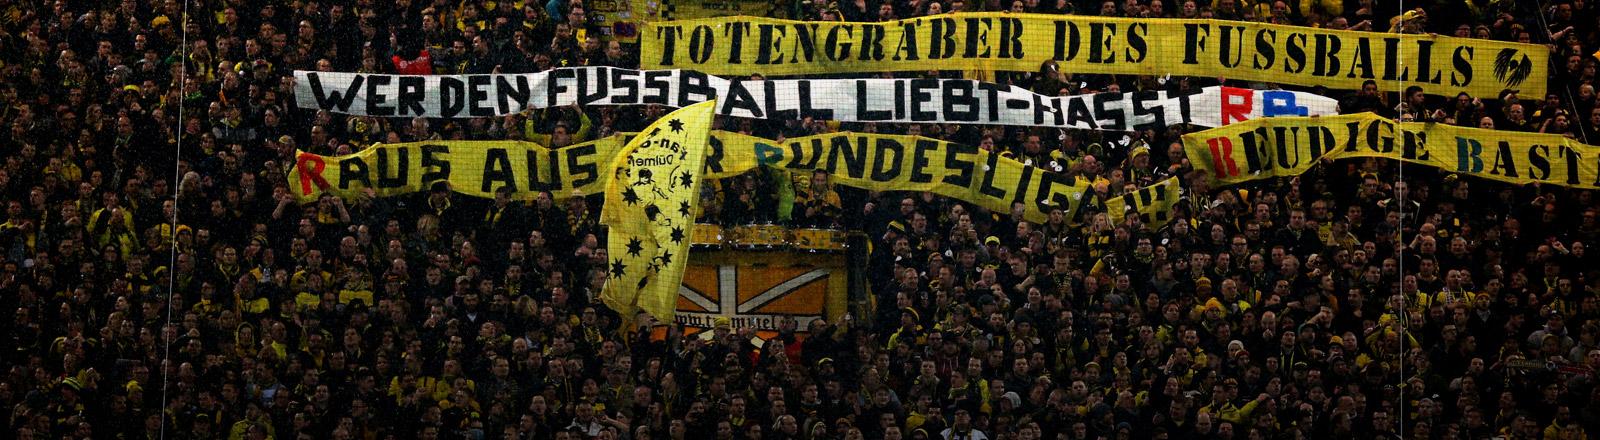 Südtribüne im Dortmunder Stadion mit Plakaten gegen RB Leipzig